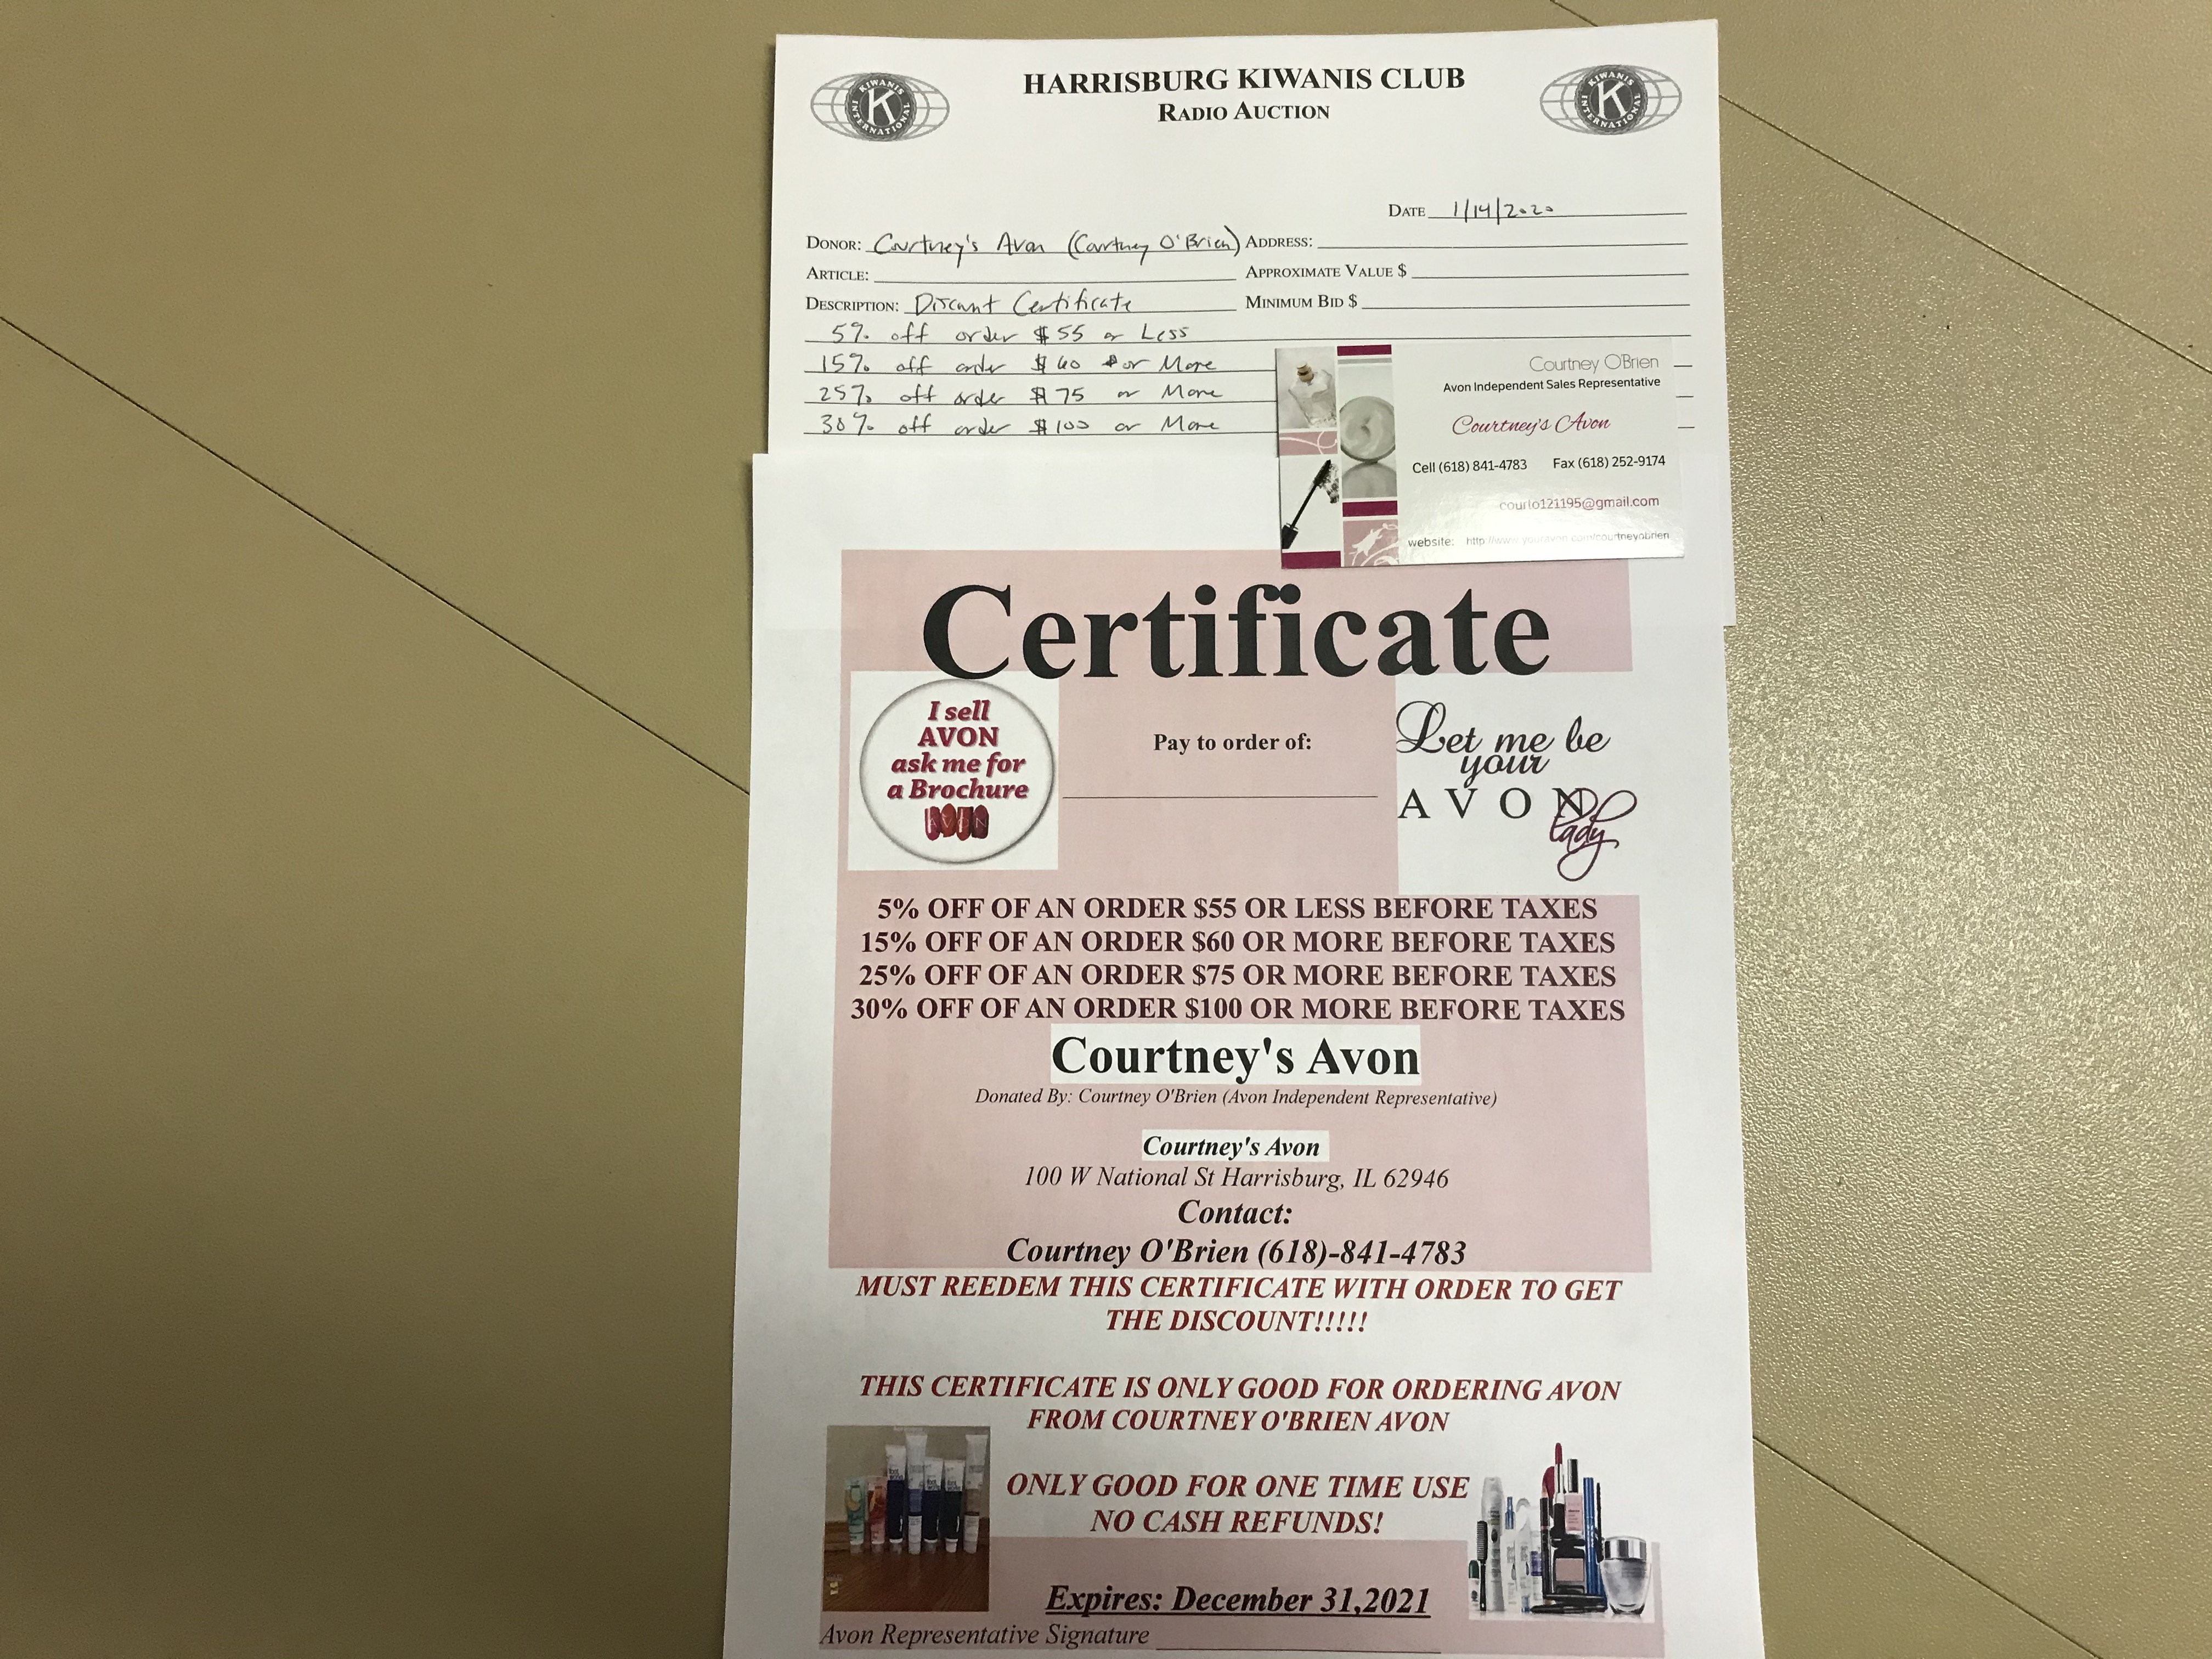 Item 322 - Courtney's Avon Discount Certificate